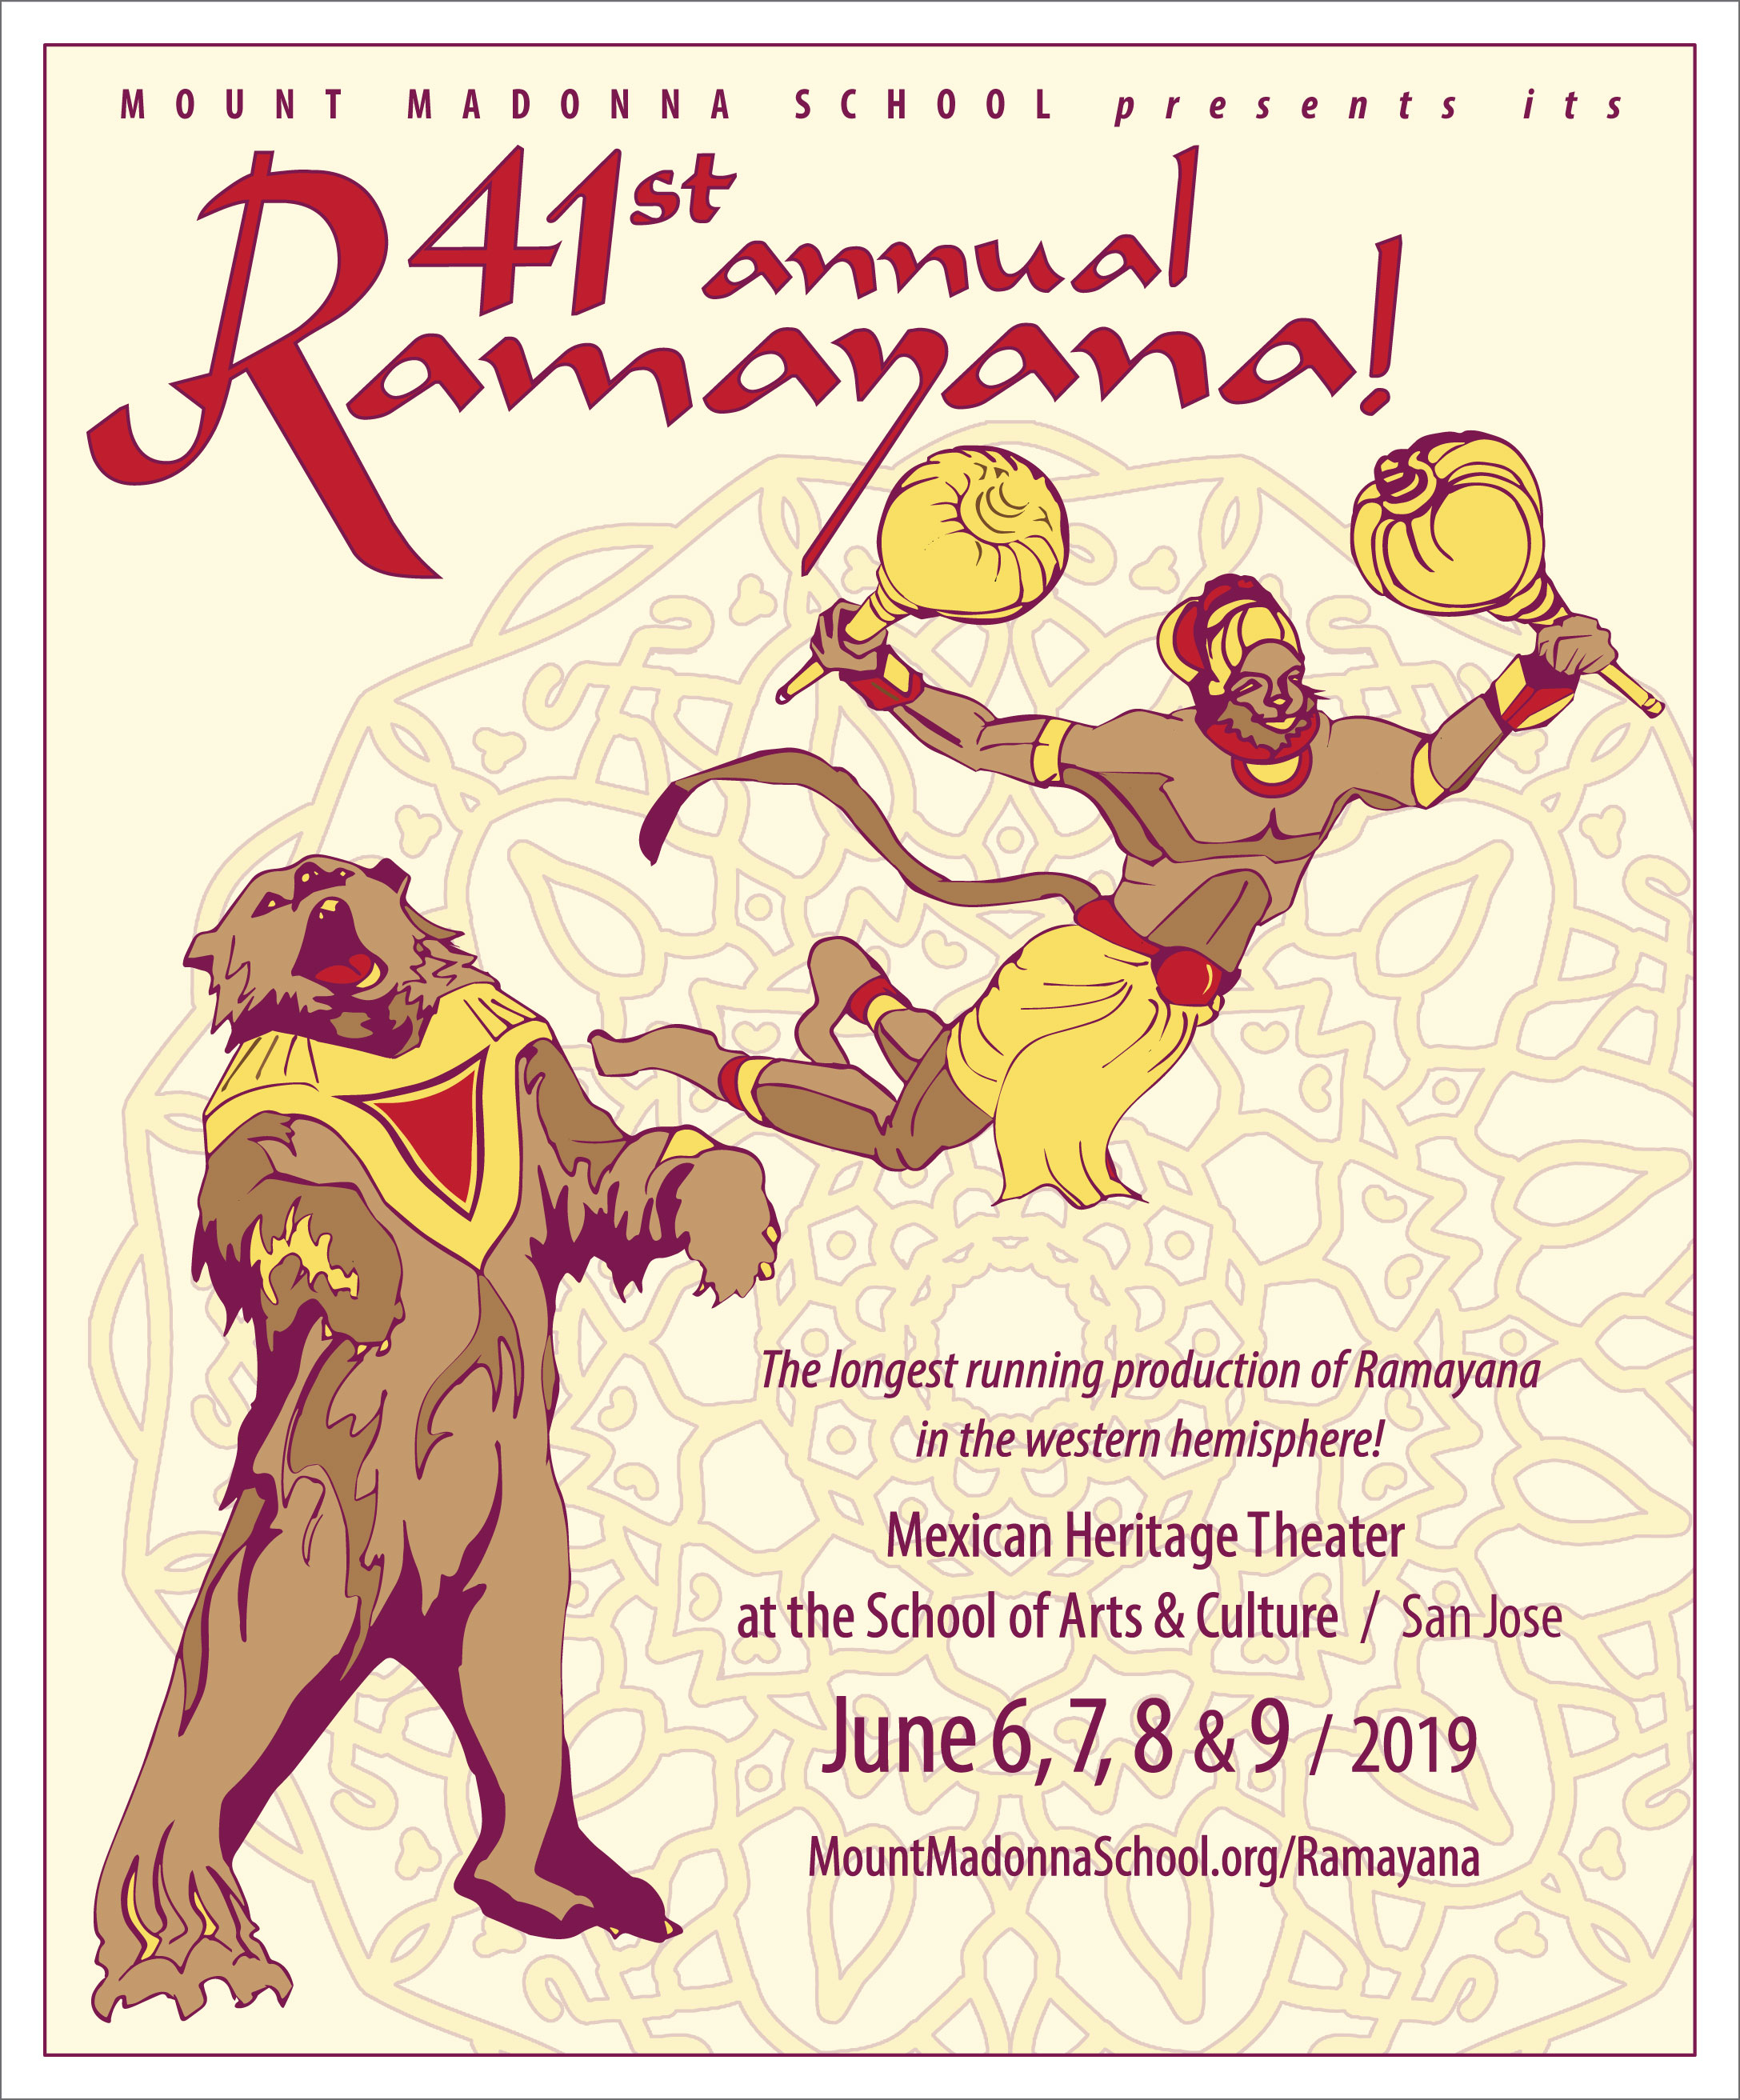 2019 <i>Ramayana!</i> Video Download